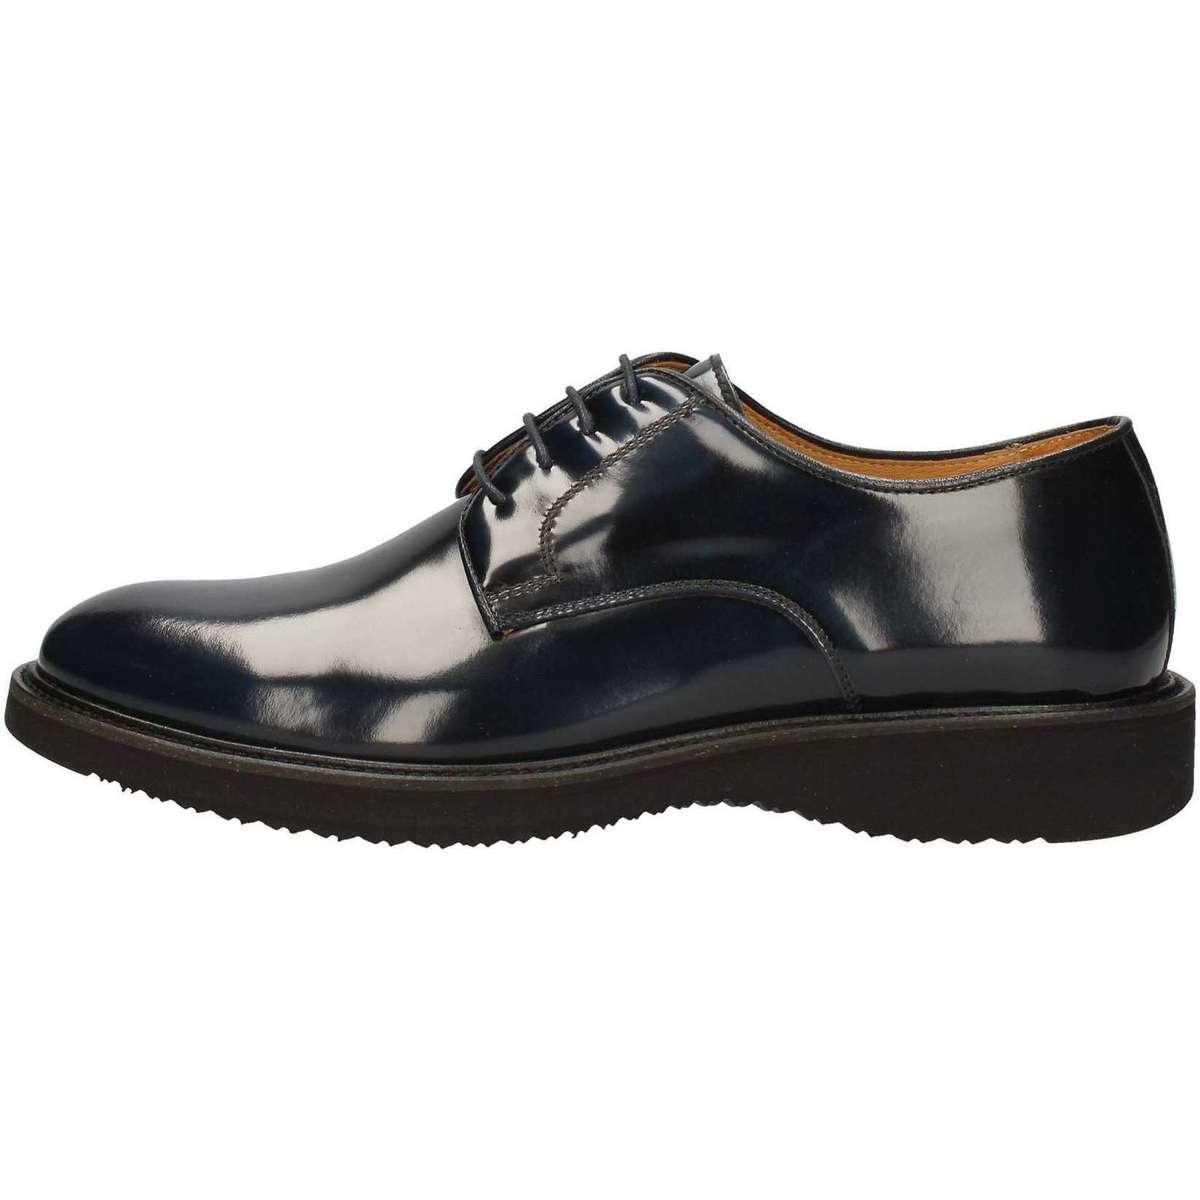 Hudson 701 Lace up shoes Mann Blau Blau - Schuhe Derby-Schuhe Herren 92,20 €